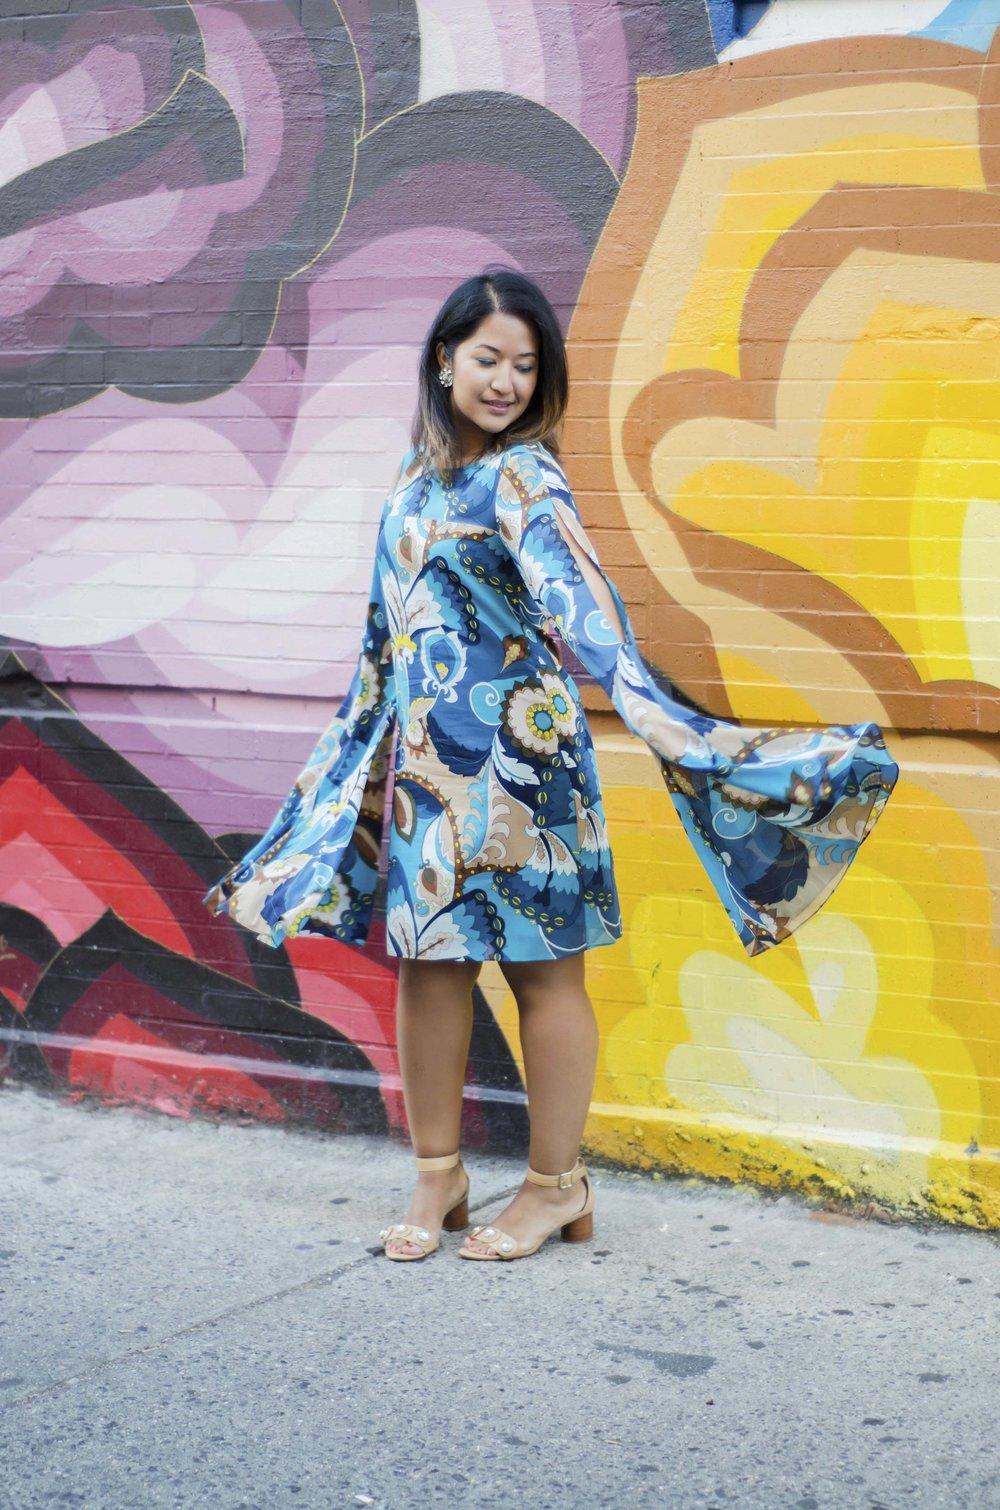 NYFW Trina Turk Dress8.jpg